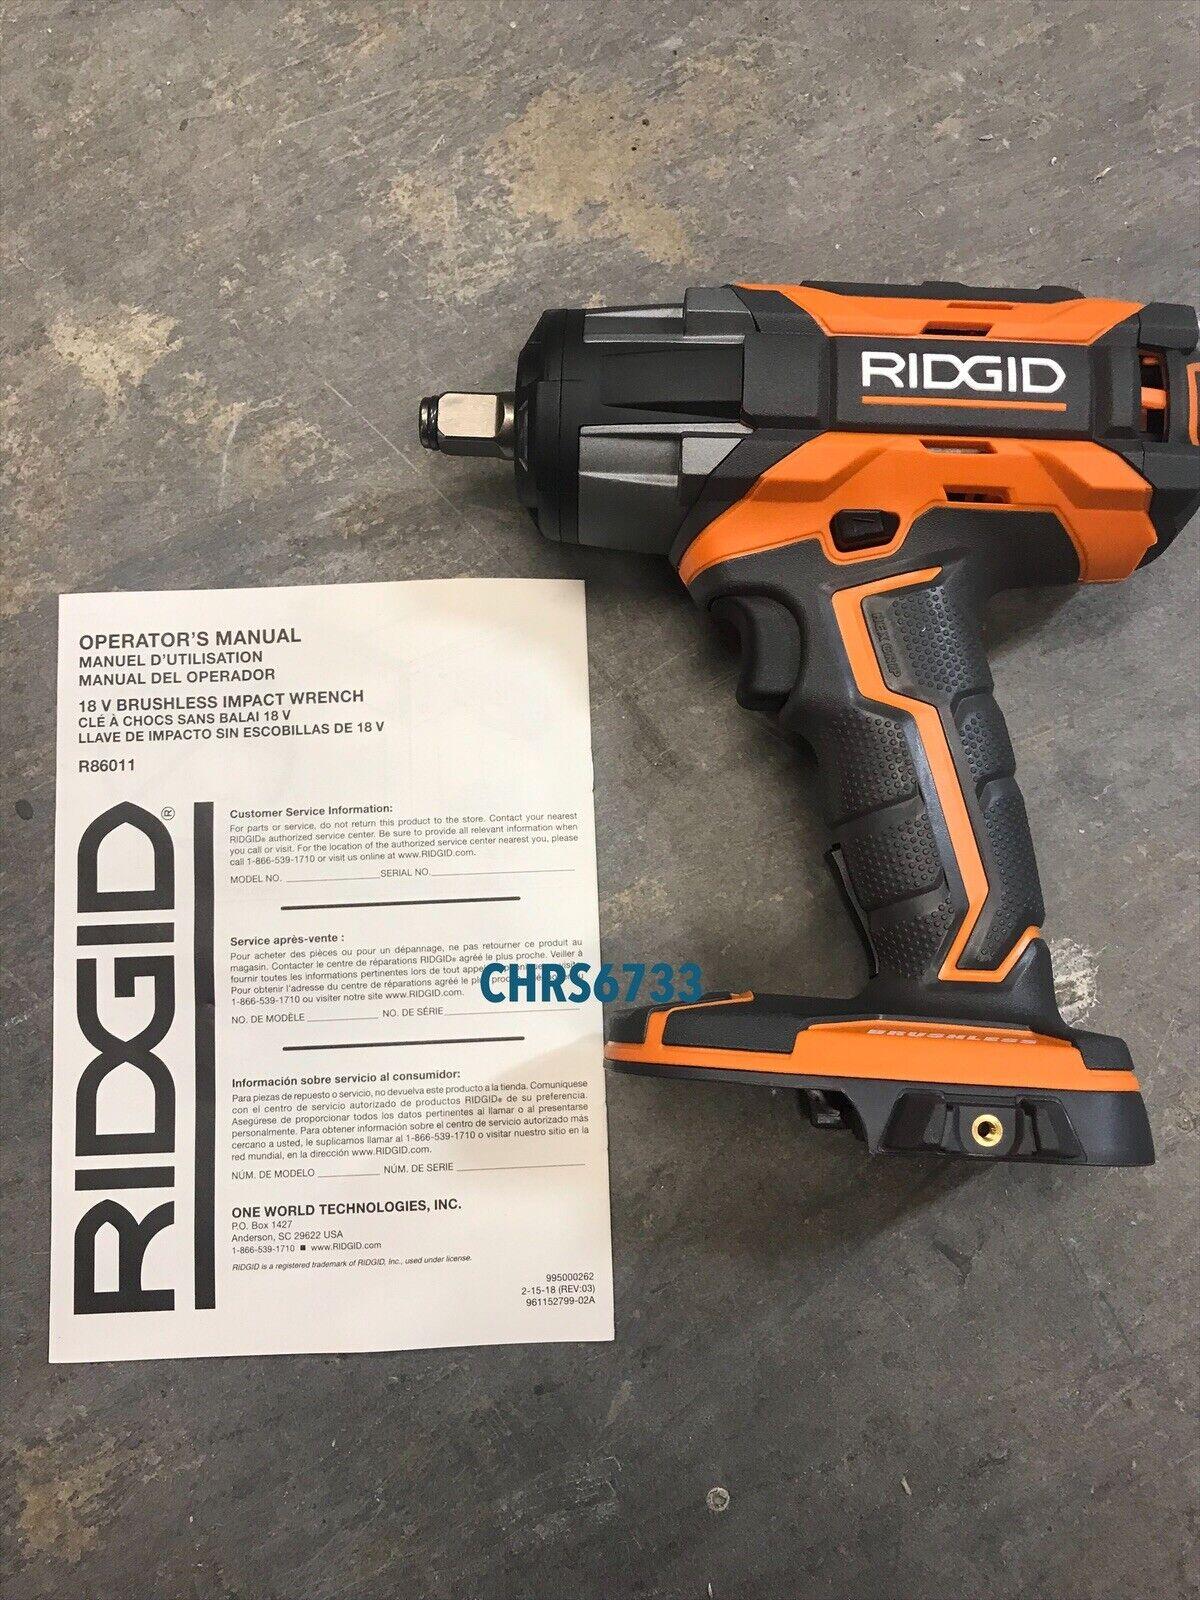 NEW RIDGID R86011B 18v 1 2  Cordless Impact Wrench Brushless Gen5x Tool Only